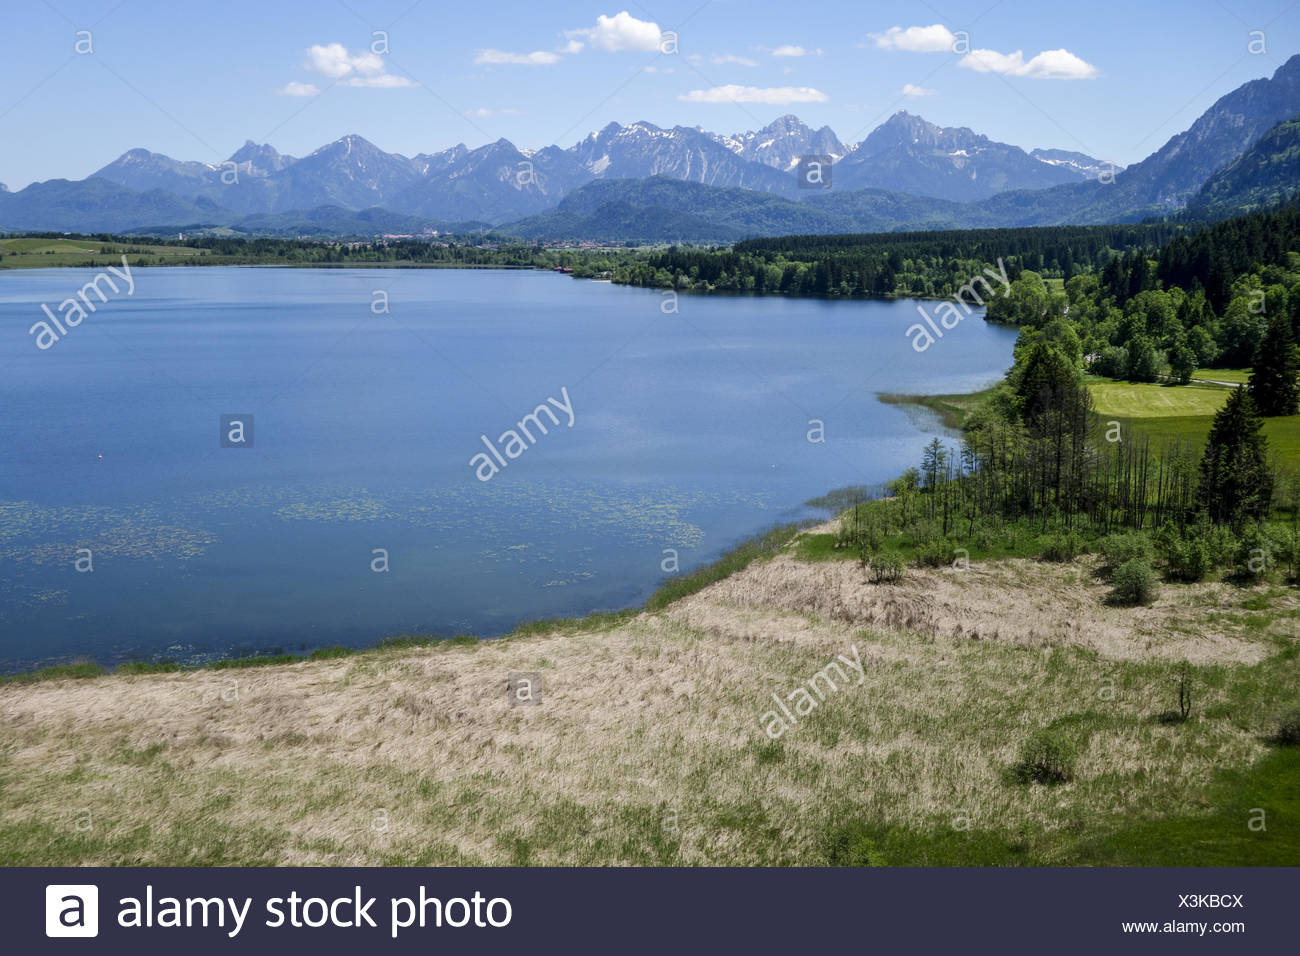 Blick auf den Bannwaldsee im Ostallgäu, Königswinkel, Tannheimer Alpen, Overlooking the Bannwaldsee in Ostallgaeu, Koenigswinkel - Stock Image